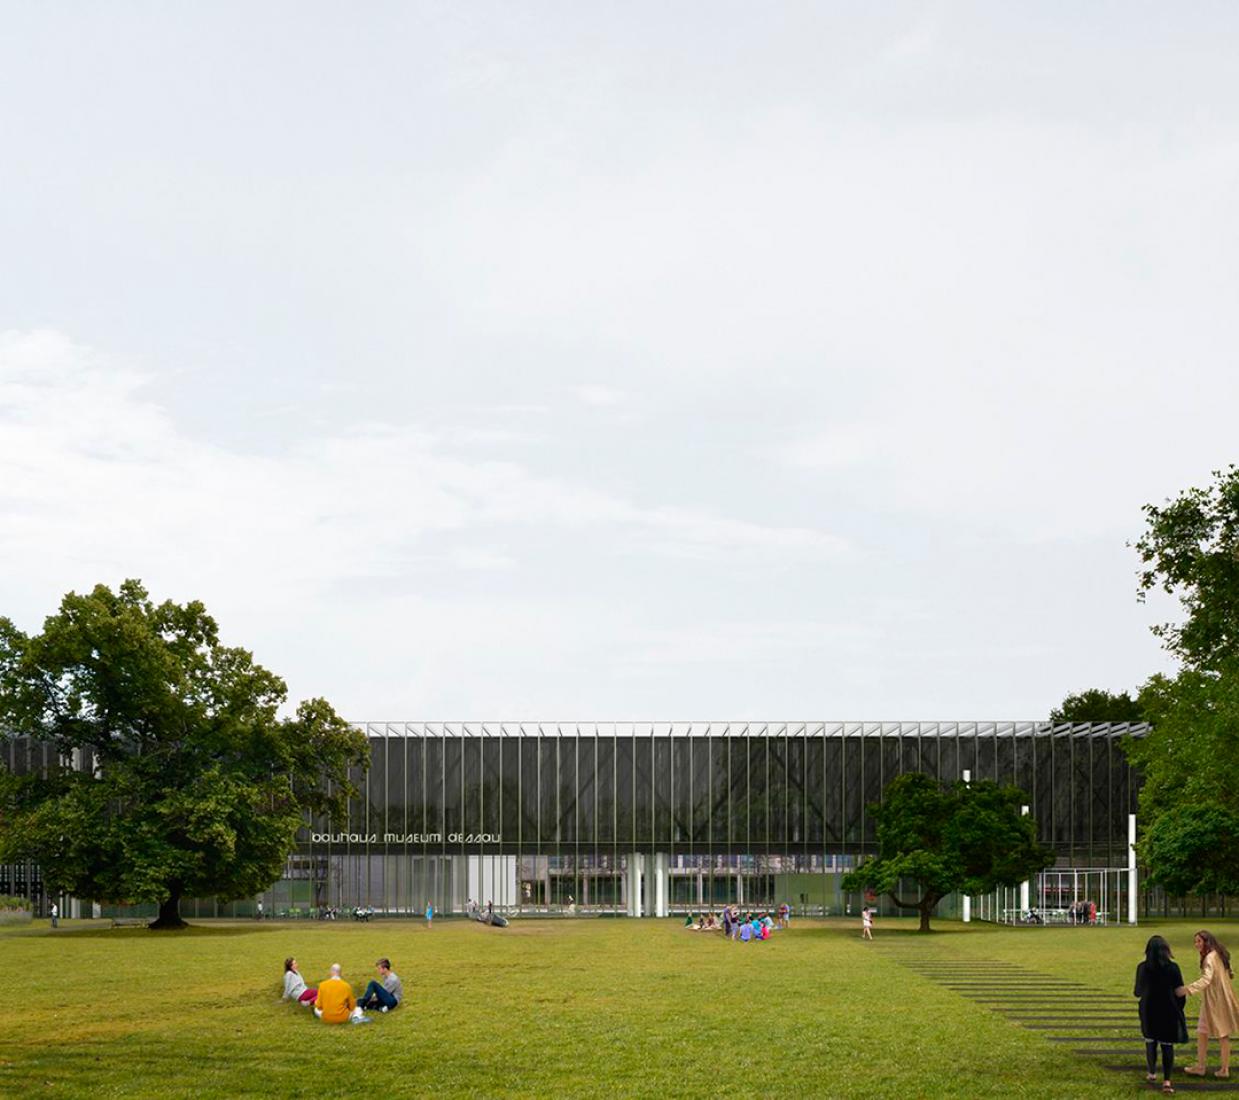 Bauhaus Museum Dessau competition. First prize, ex-aequo. Project by González Hinz Zabala. Courtesy of Bauhaus Museum Dessau.